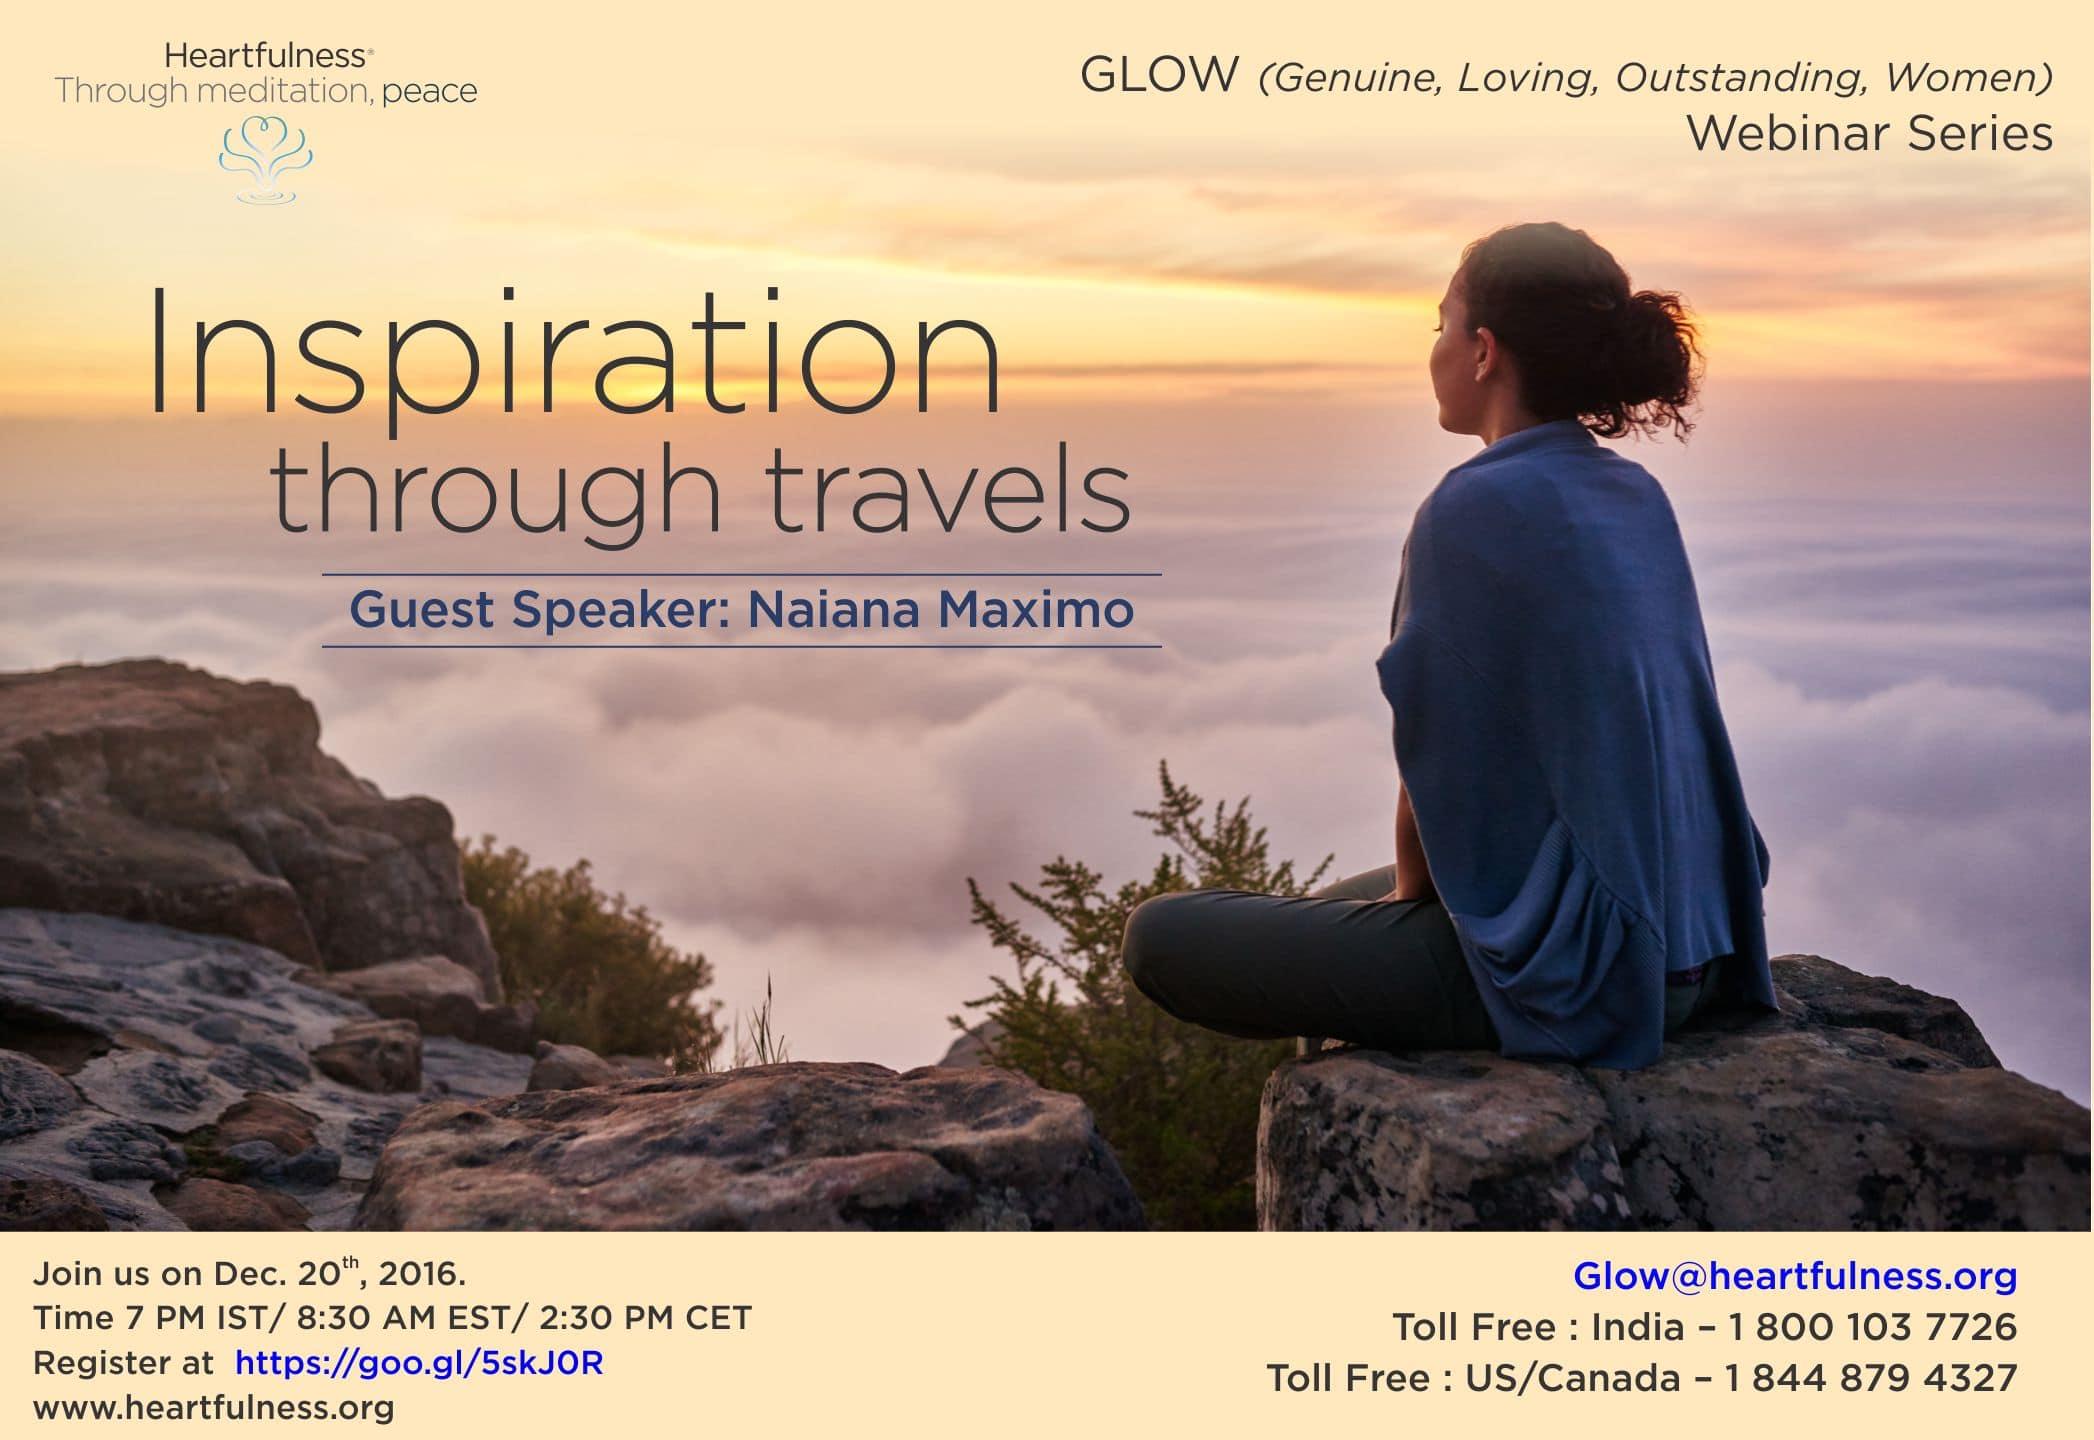 GLOW: #Heartfulness Webinar – Inspiration through Travels by Naiana Maximo